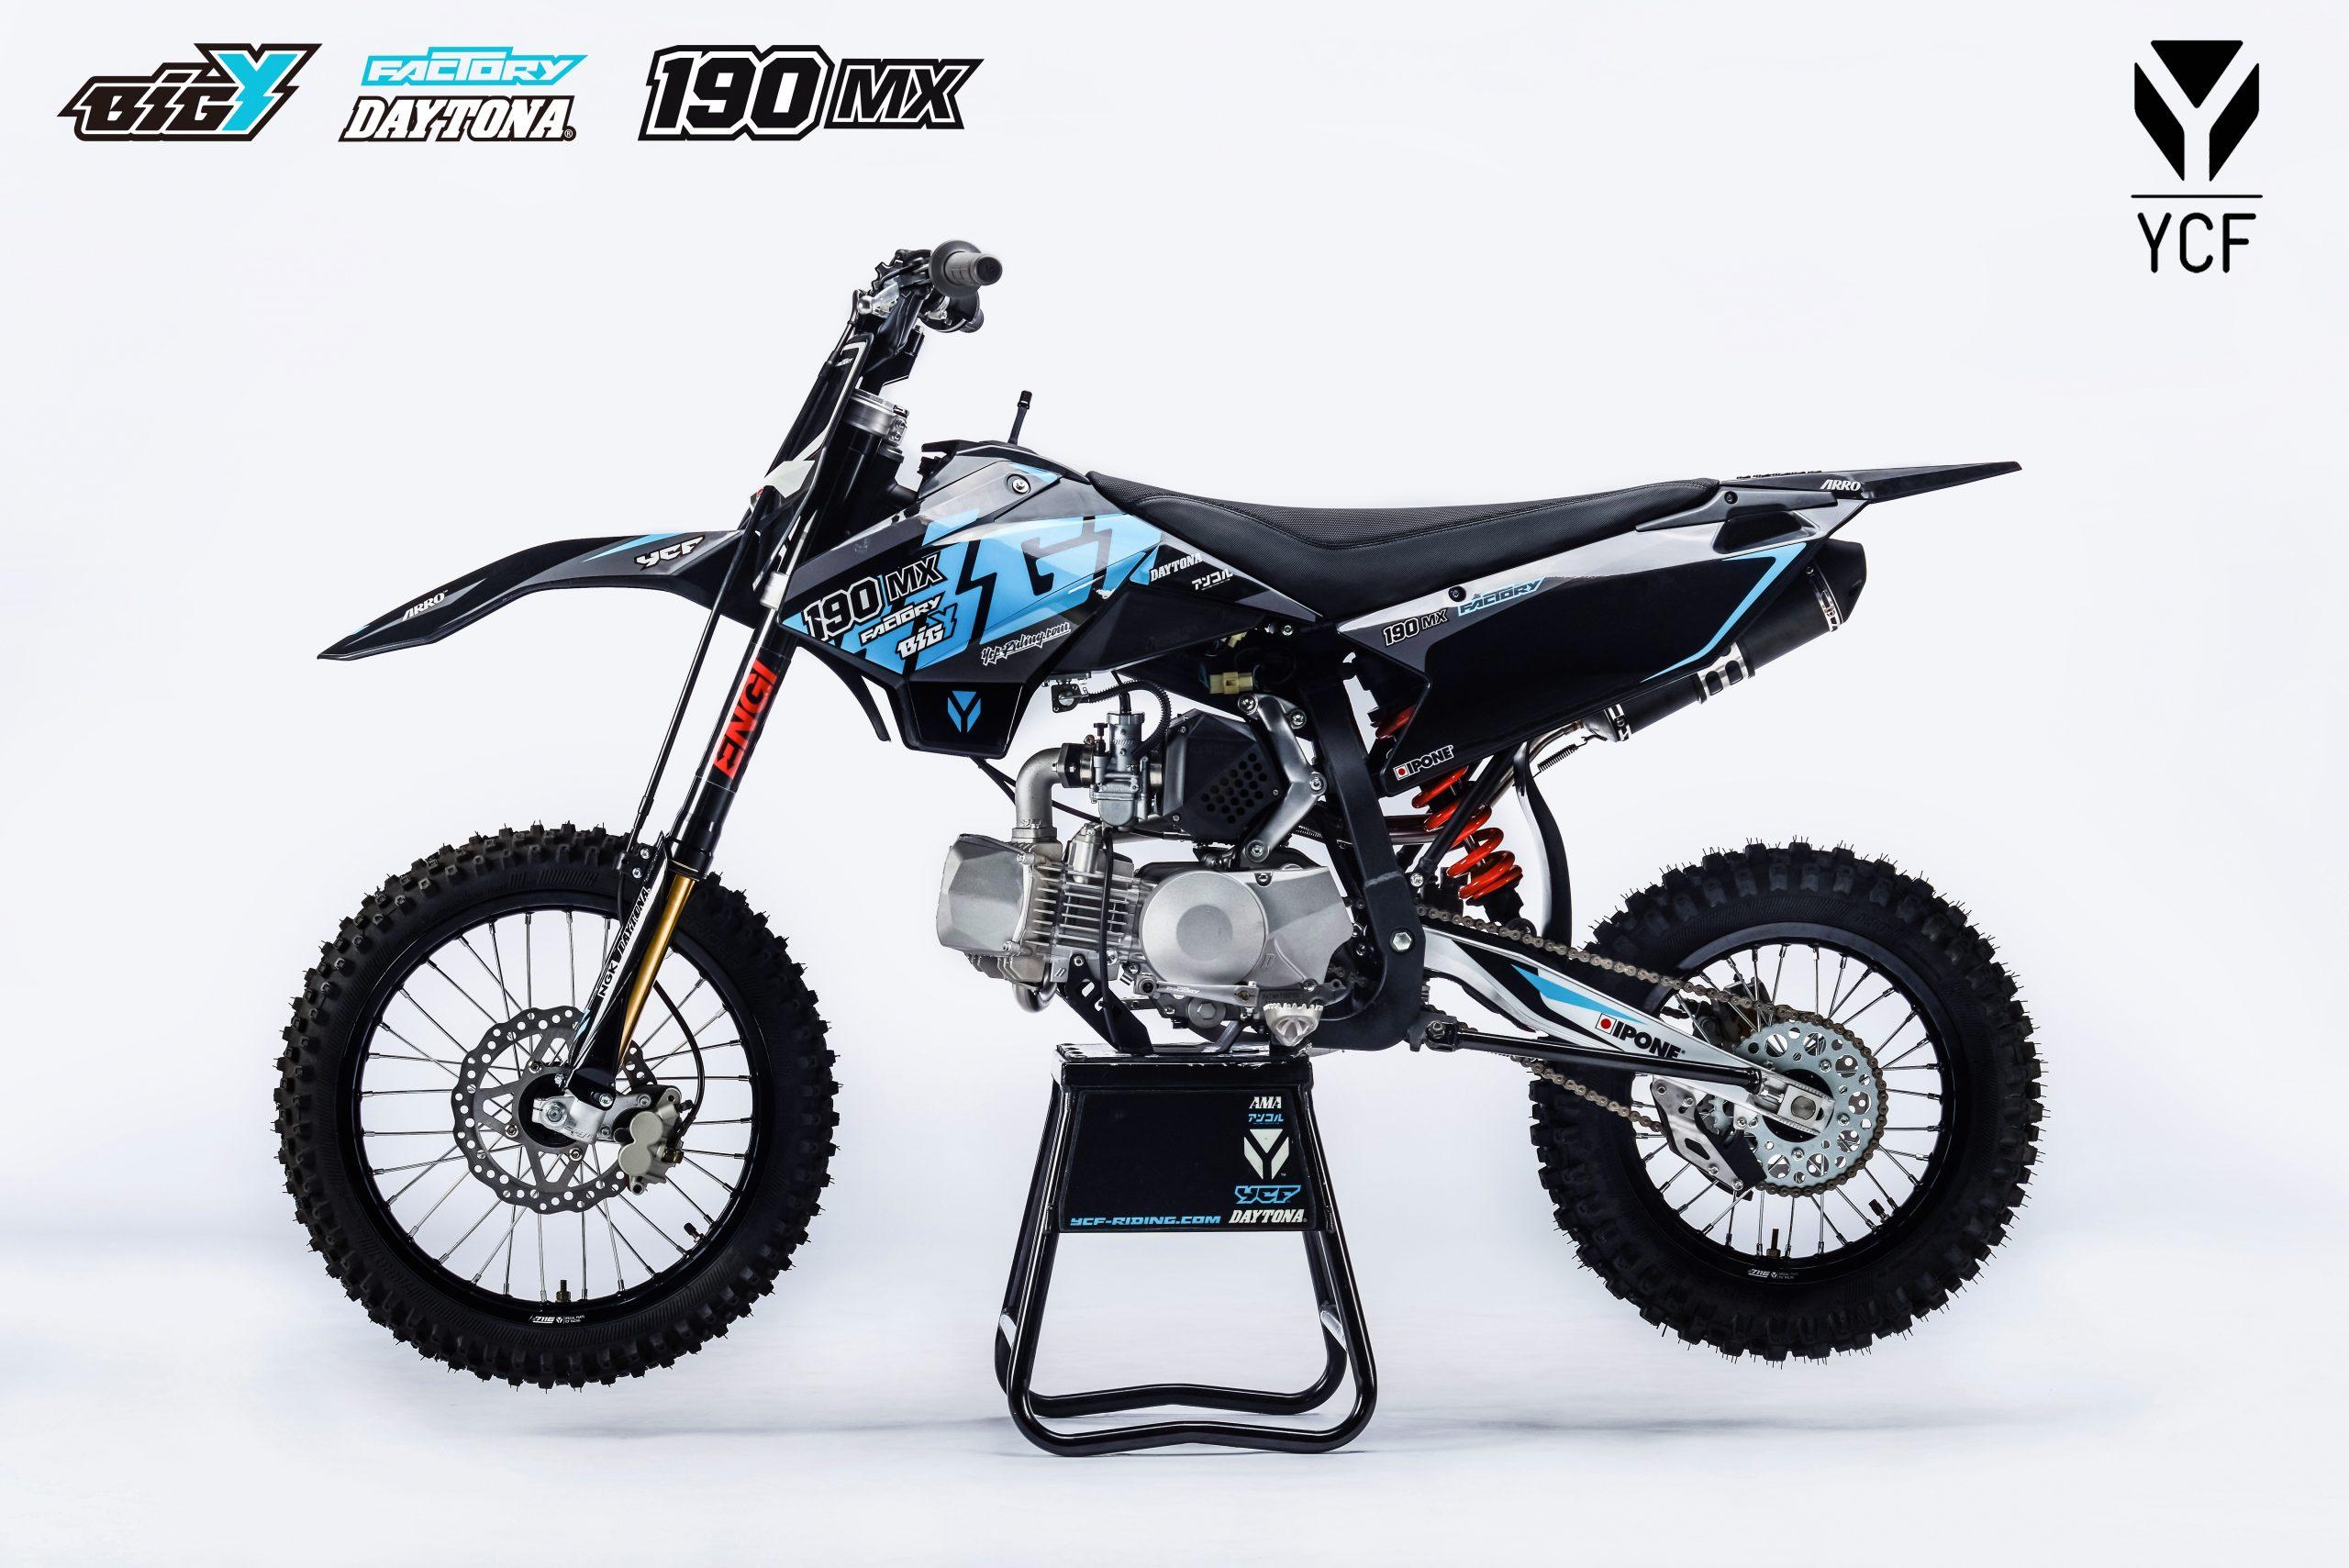 ПИТБАЙК YCF BIGY FACTORY 190 Daytona MX 2021  Артмото - купить квадроцикл в украине и харькове, мотоцикл, снегоход, скутер, мопед, электромобиль